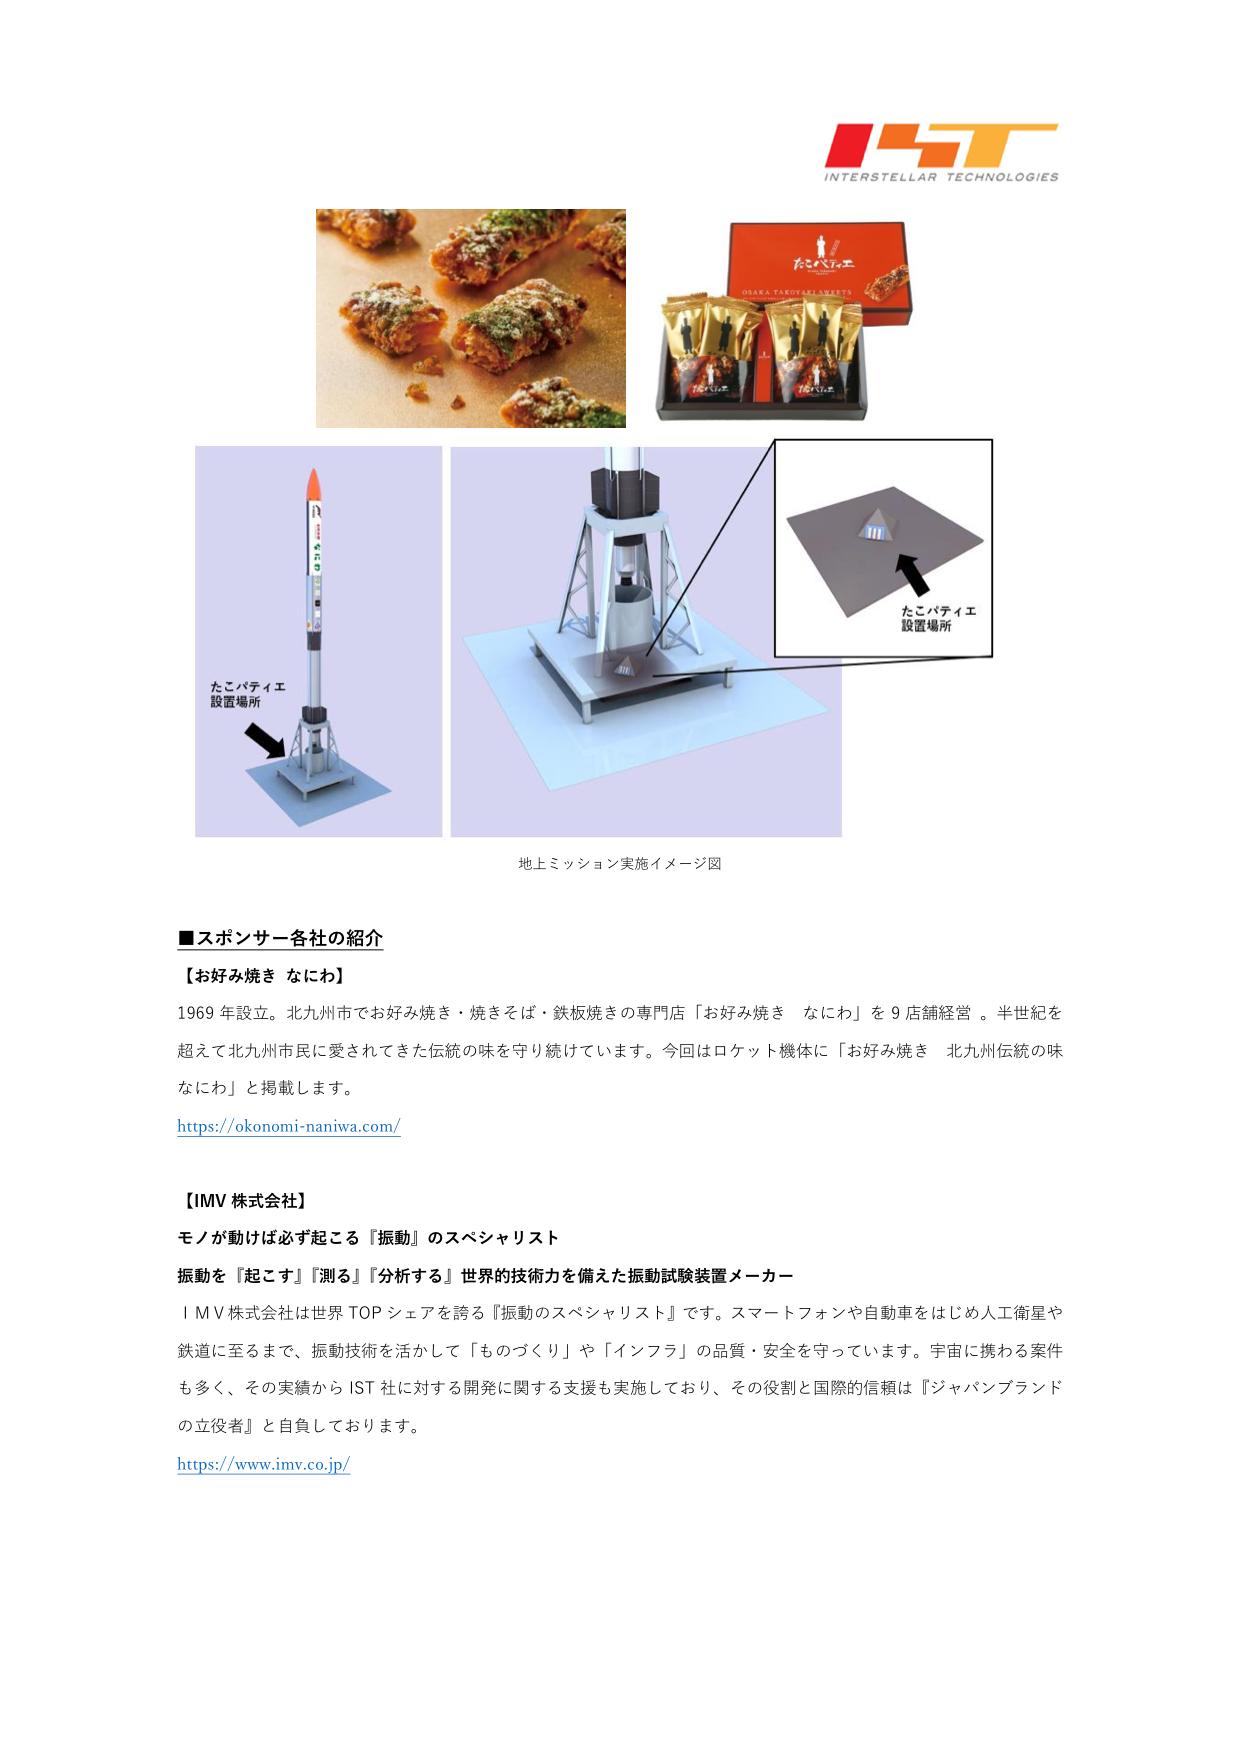 f:id:Imamura:20191126135430p:plain